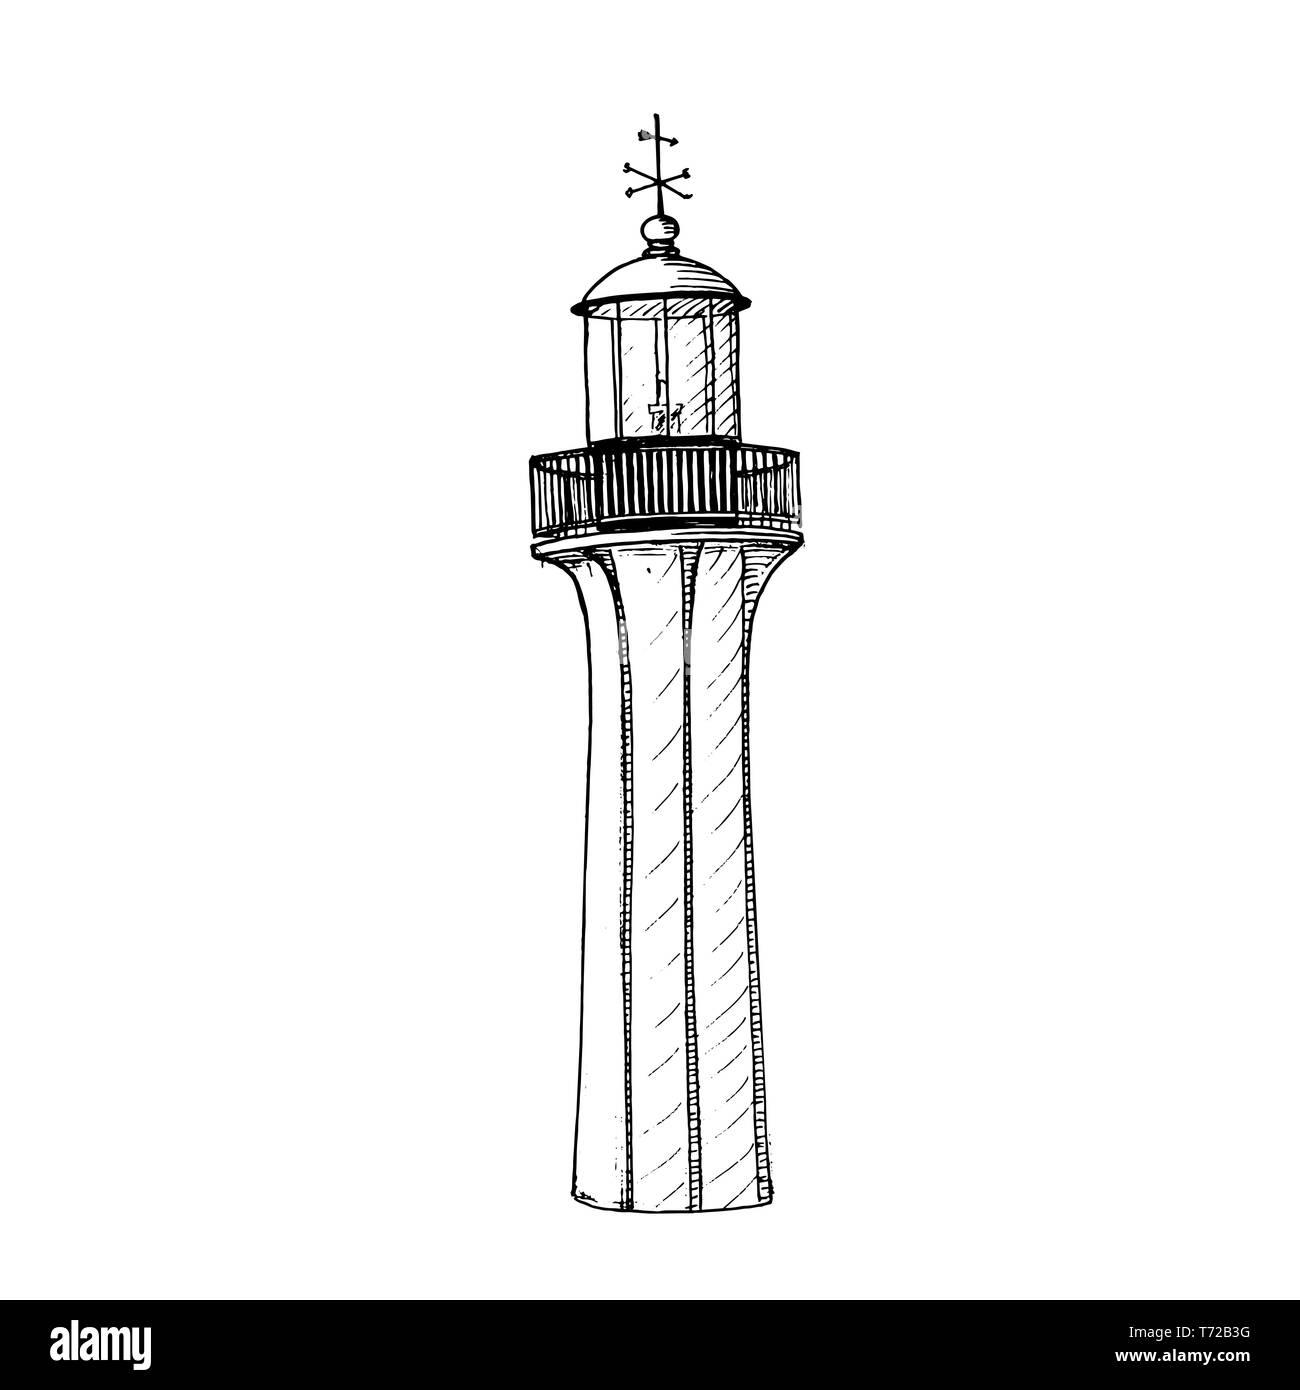 Retro Lighthouse logo template design. illustration. beacon, sea-light, pike, light tower, guiding light, seamark - Stock Image